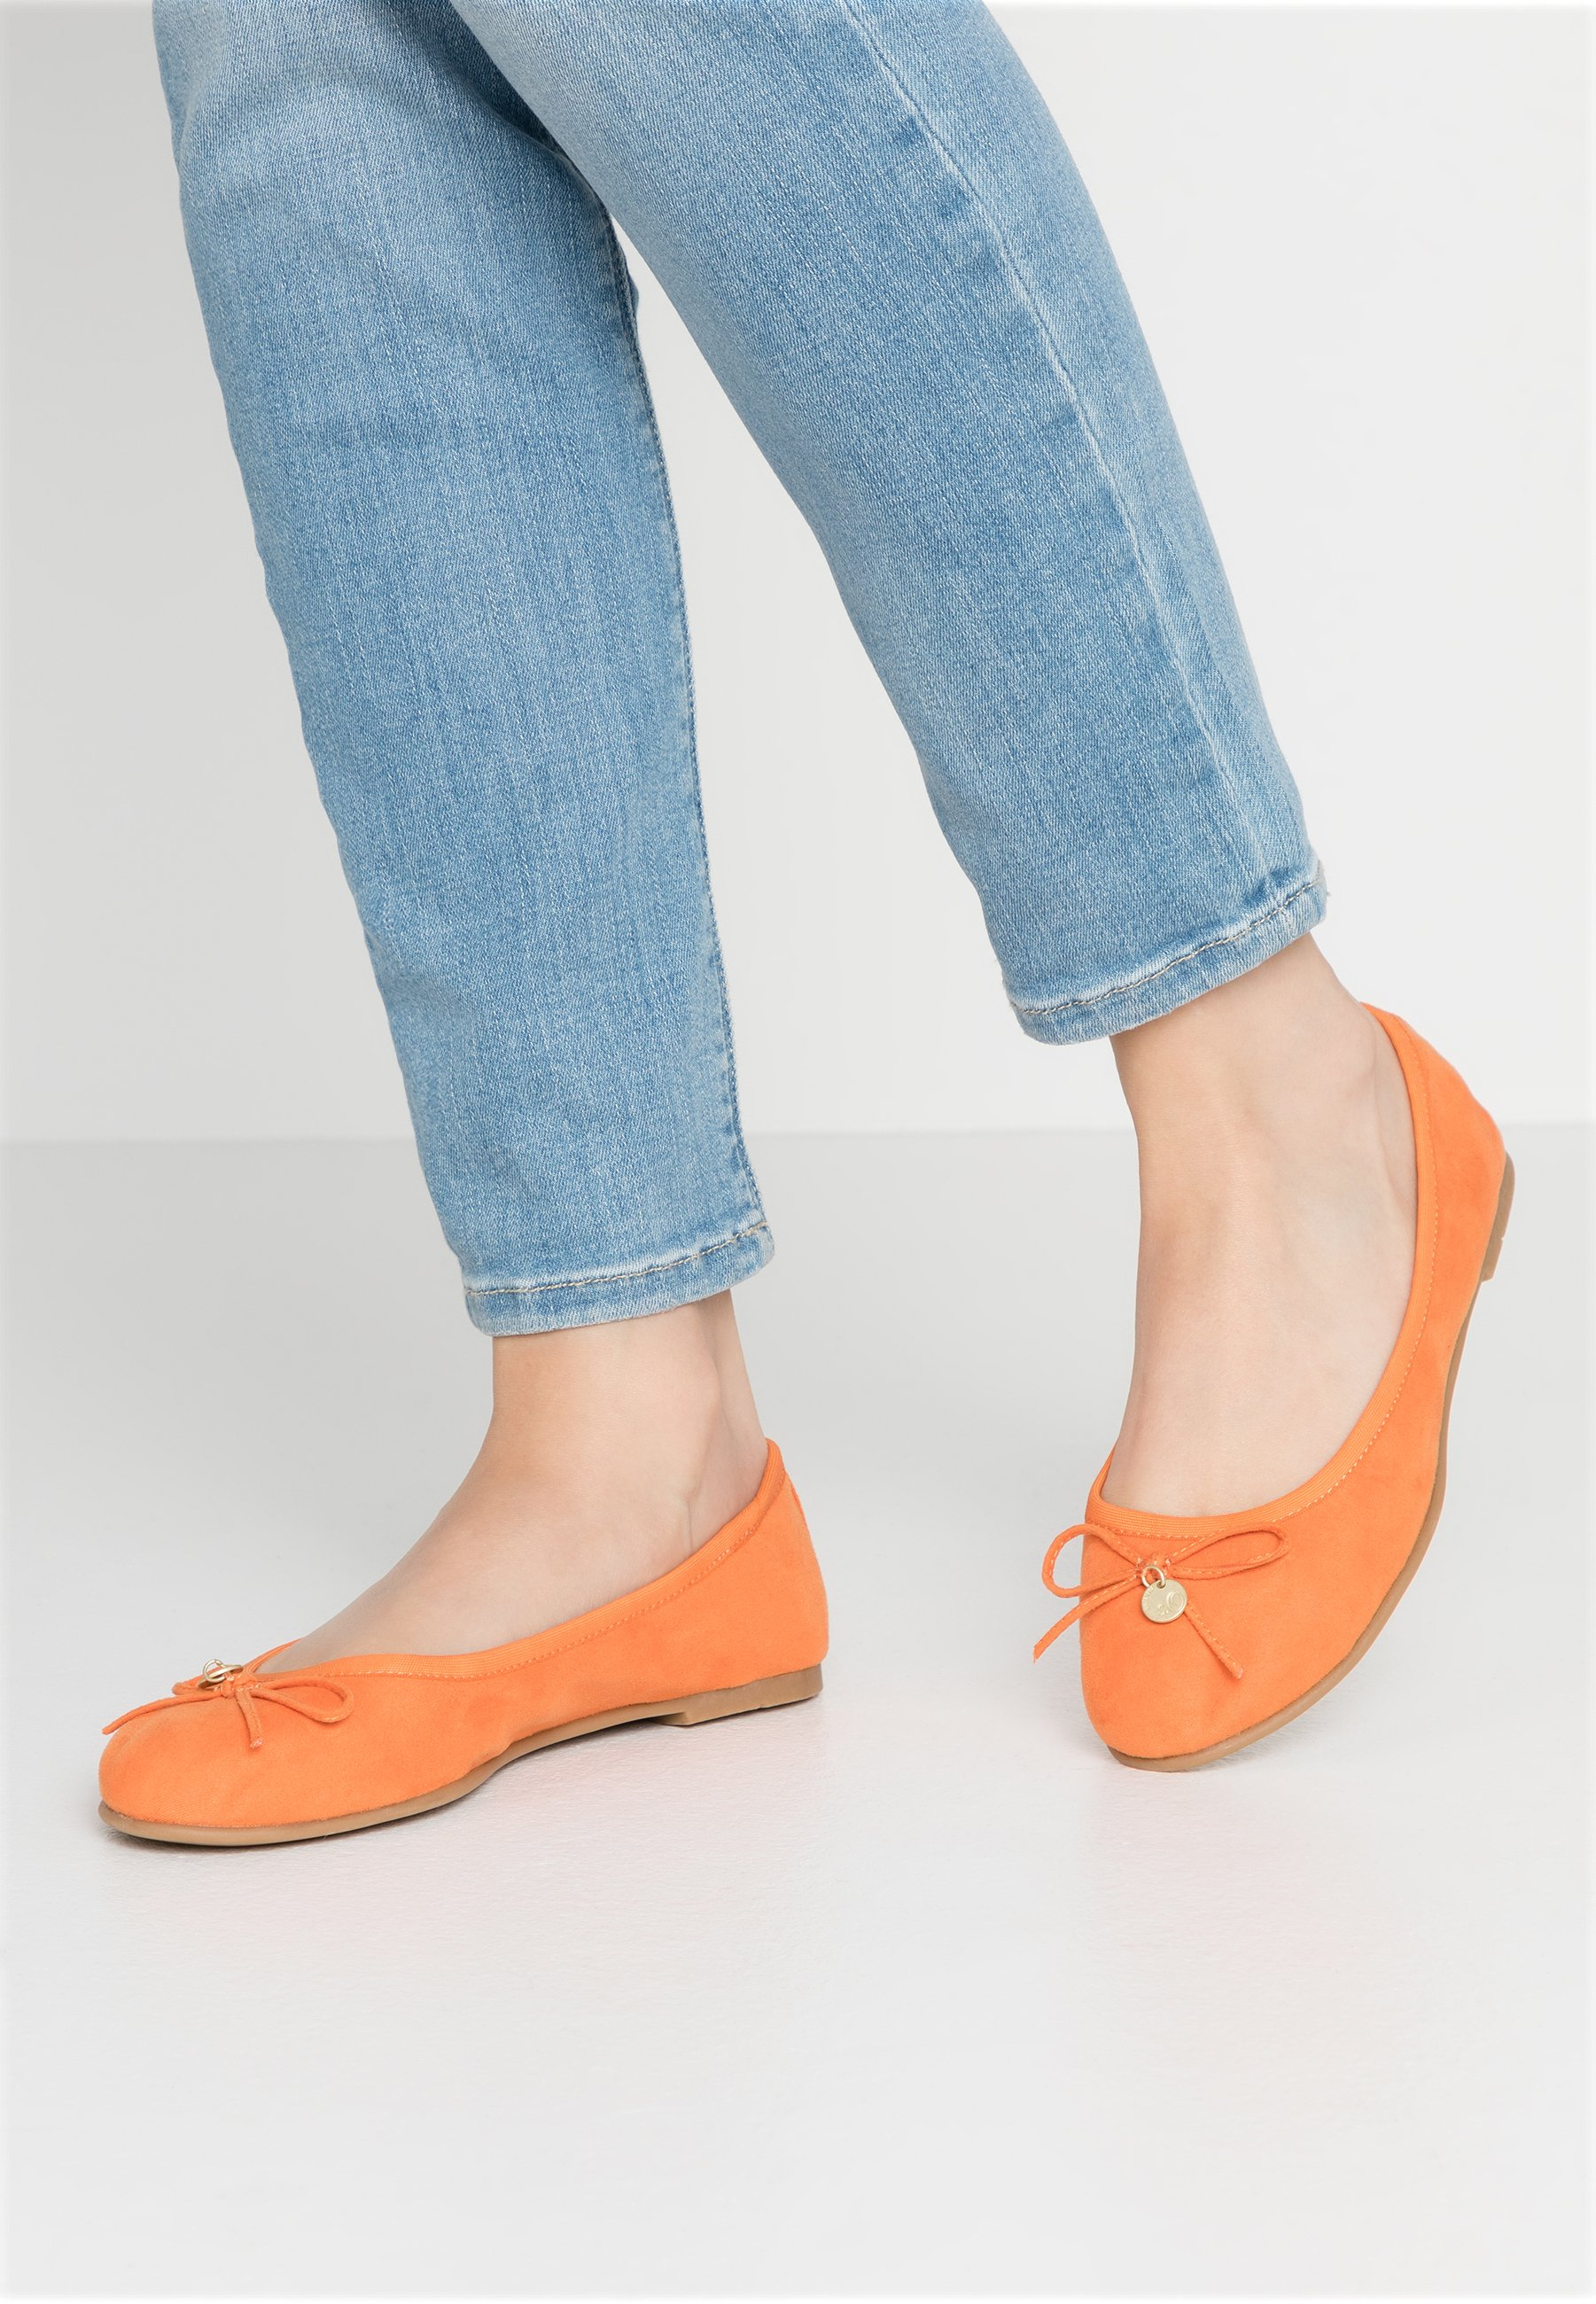 s.Oliver Ballerina - orange